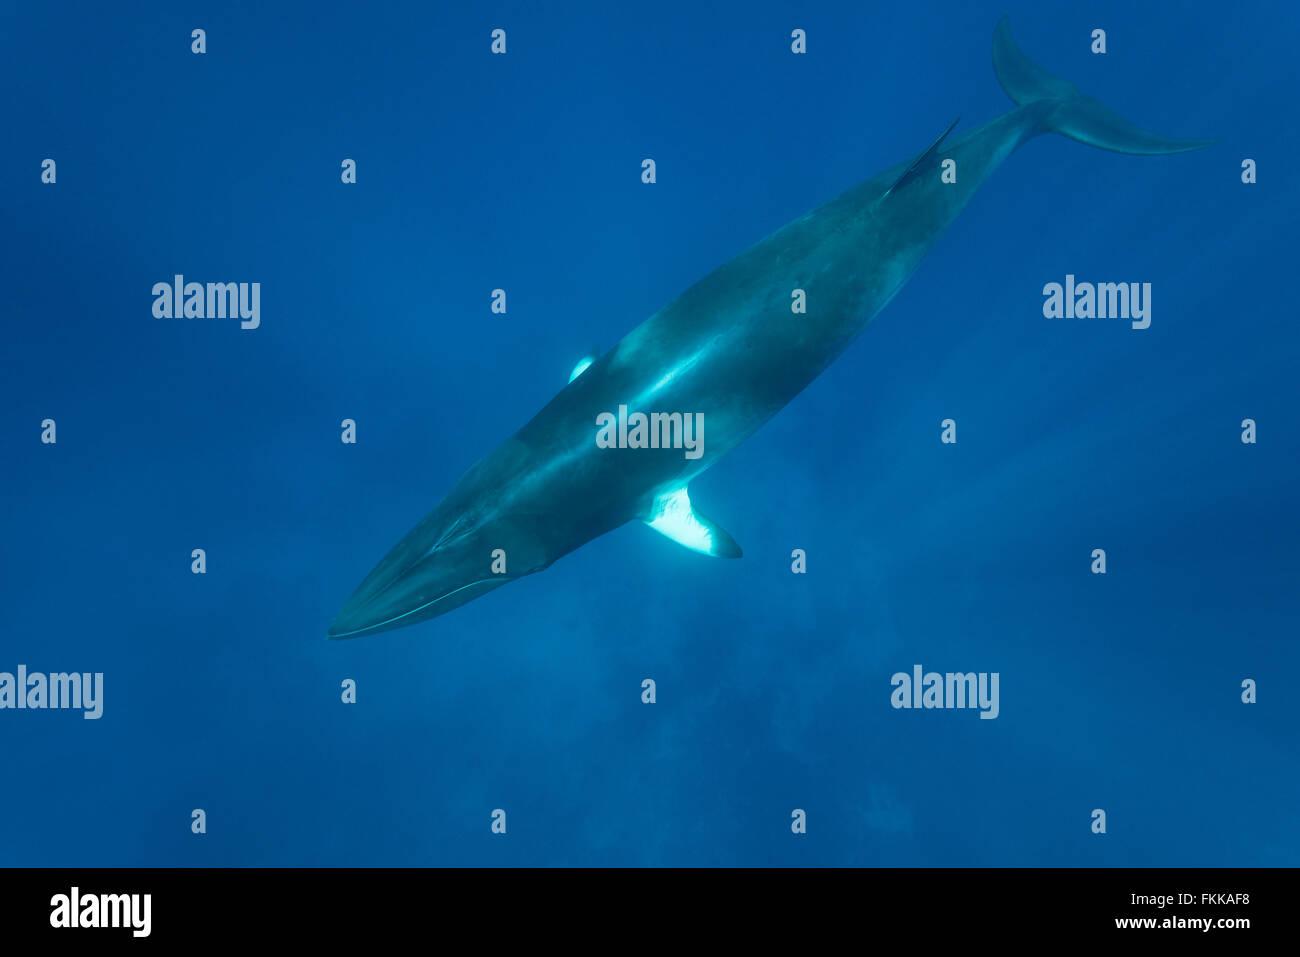 Dwarf minke whale (Balaenoptera acutorostrata) in the blue wintering waters of the Great Barrier Reef. - Stock Image